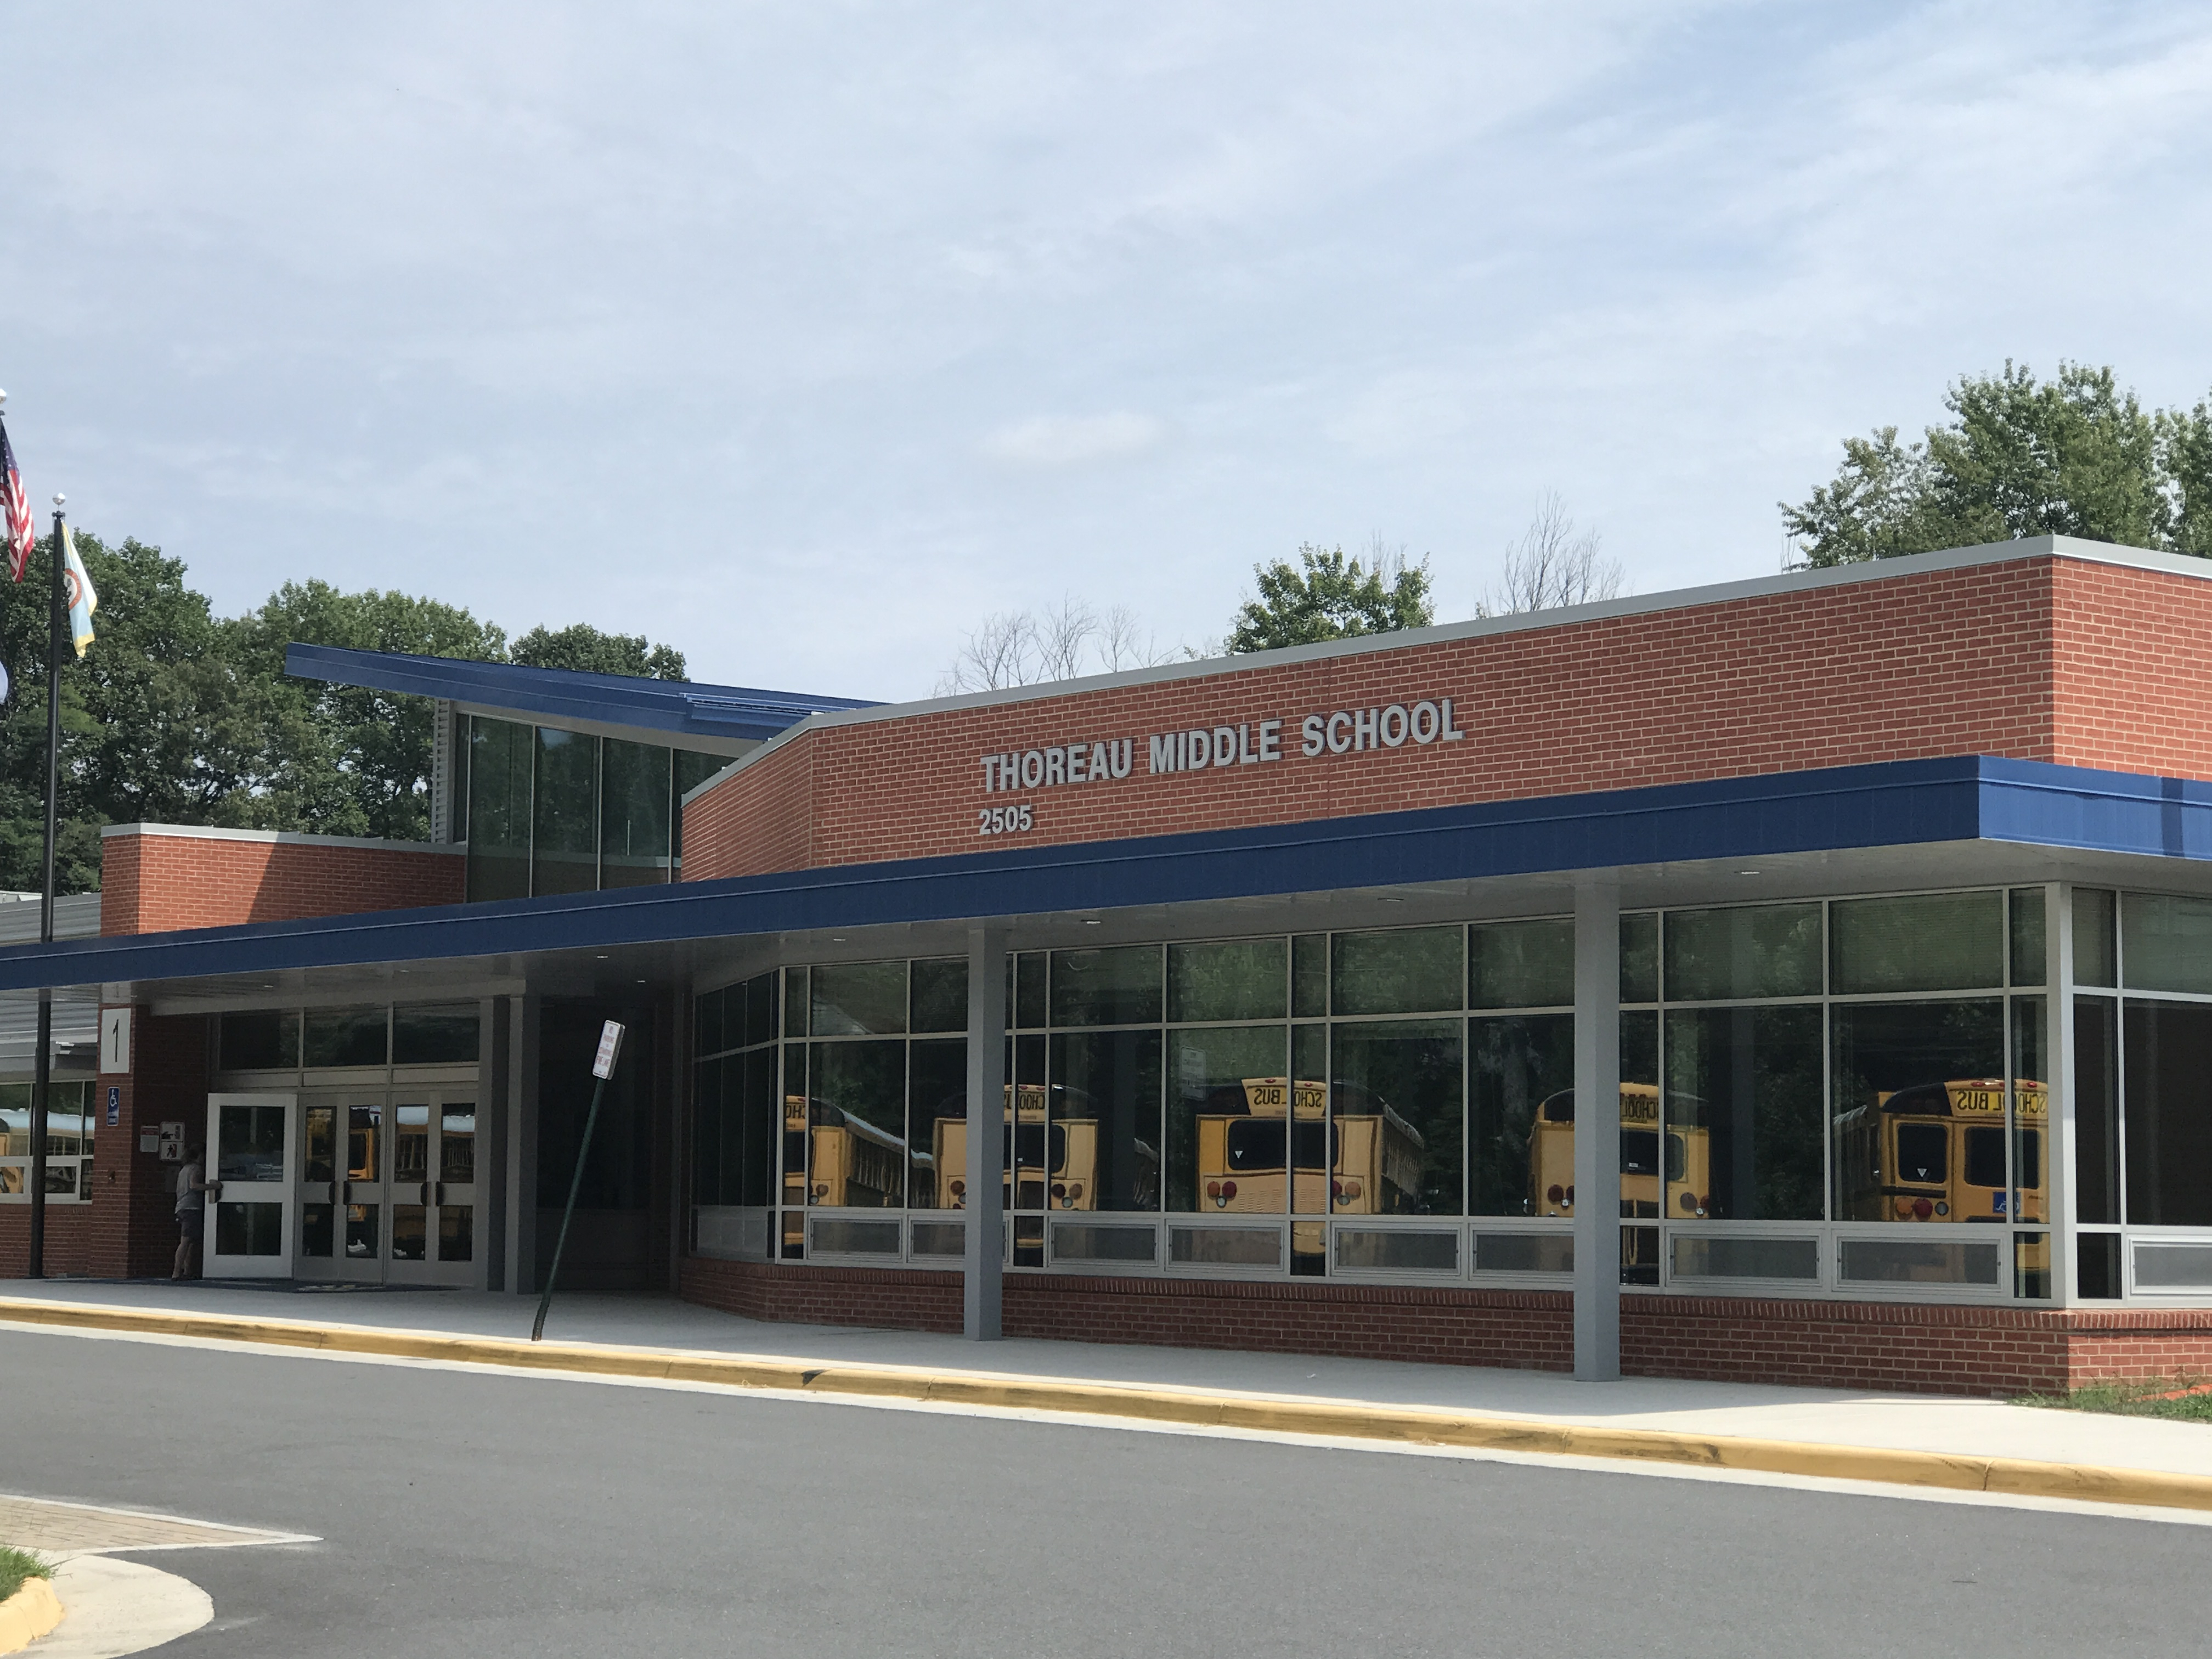 6A3B62Eb79C64Bedb472D651014Eaeb5 – Thoreau Middle School inside Thoreau Middle School Blue Gold Calendar